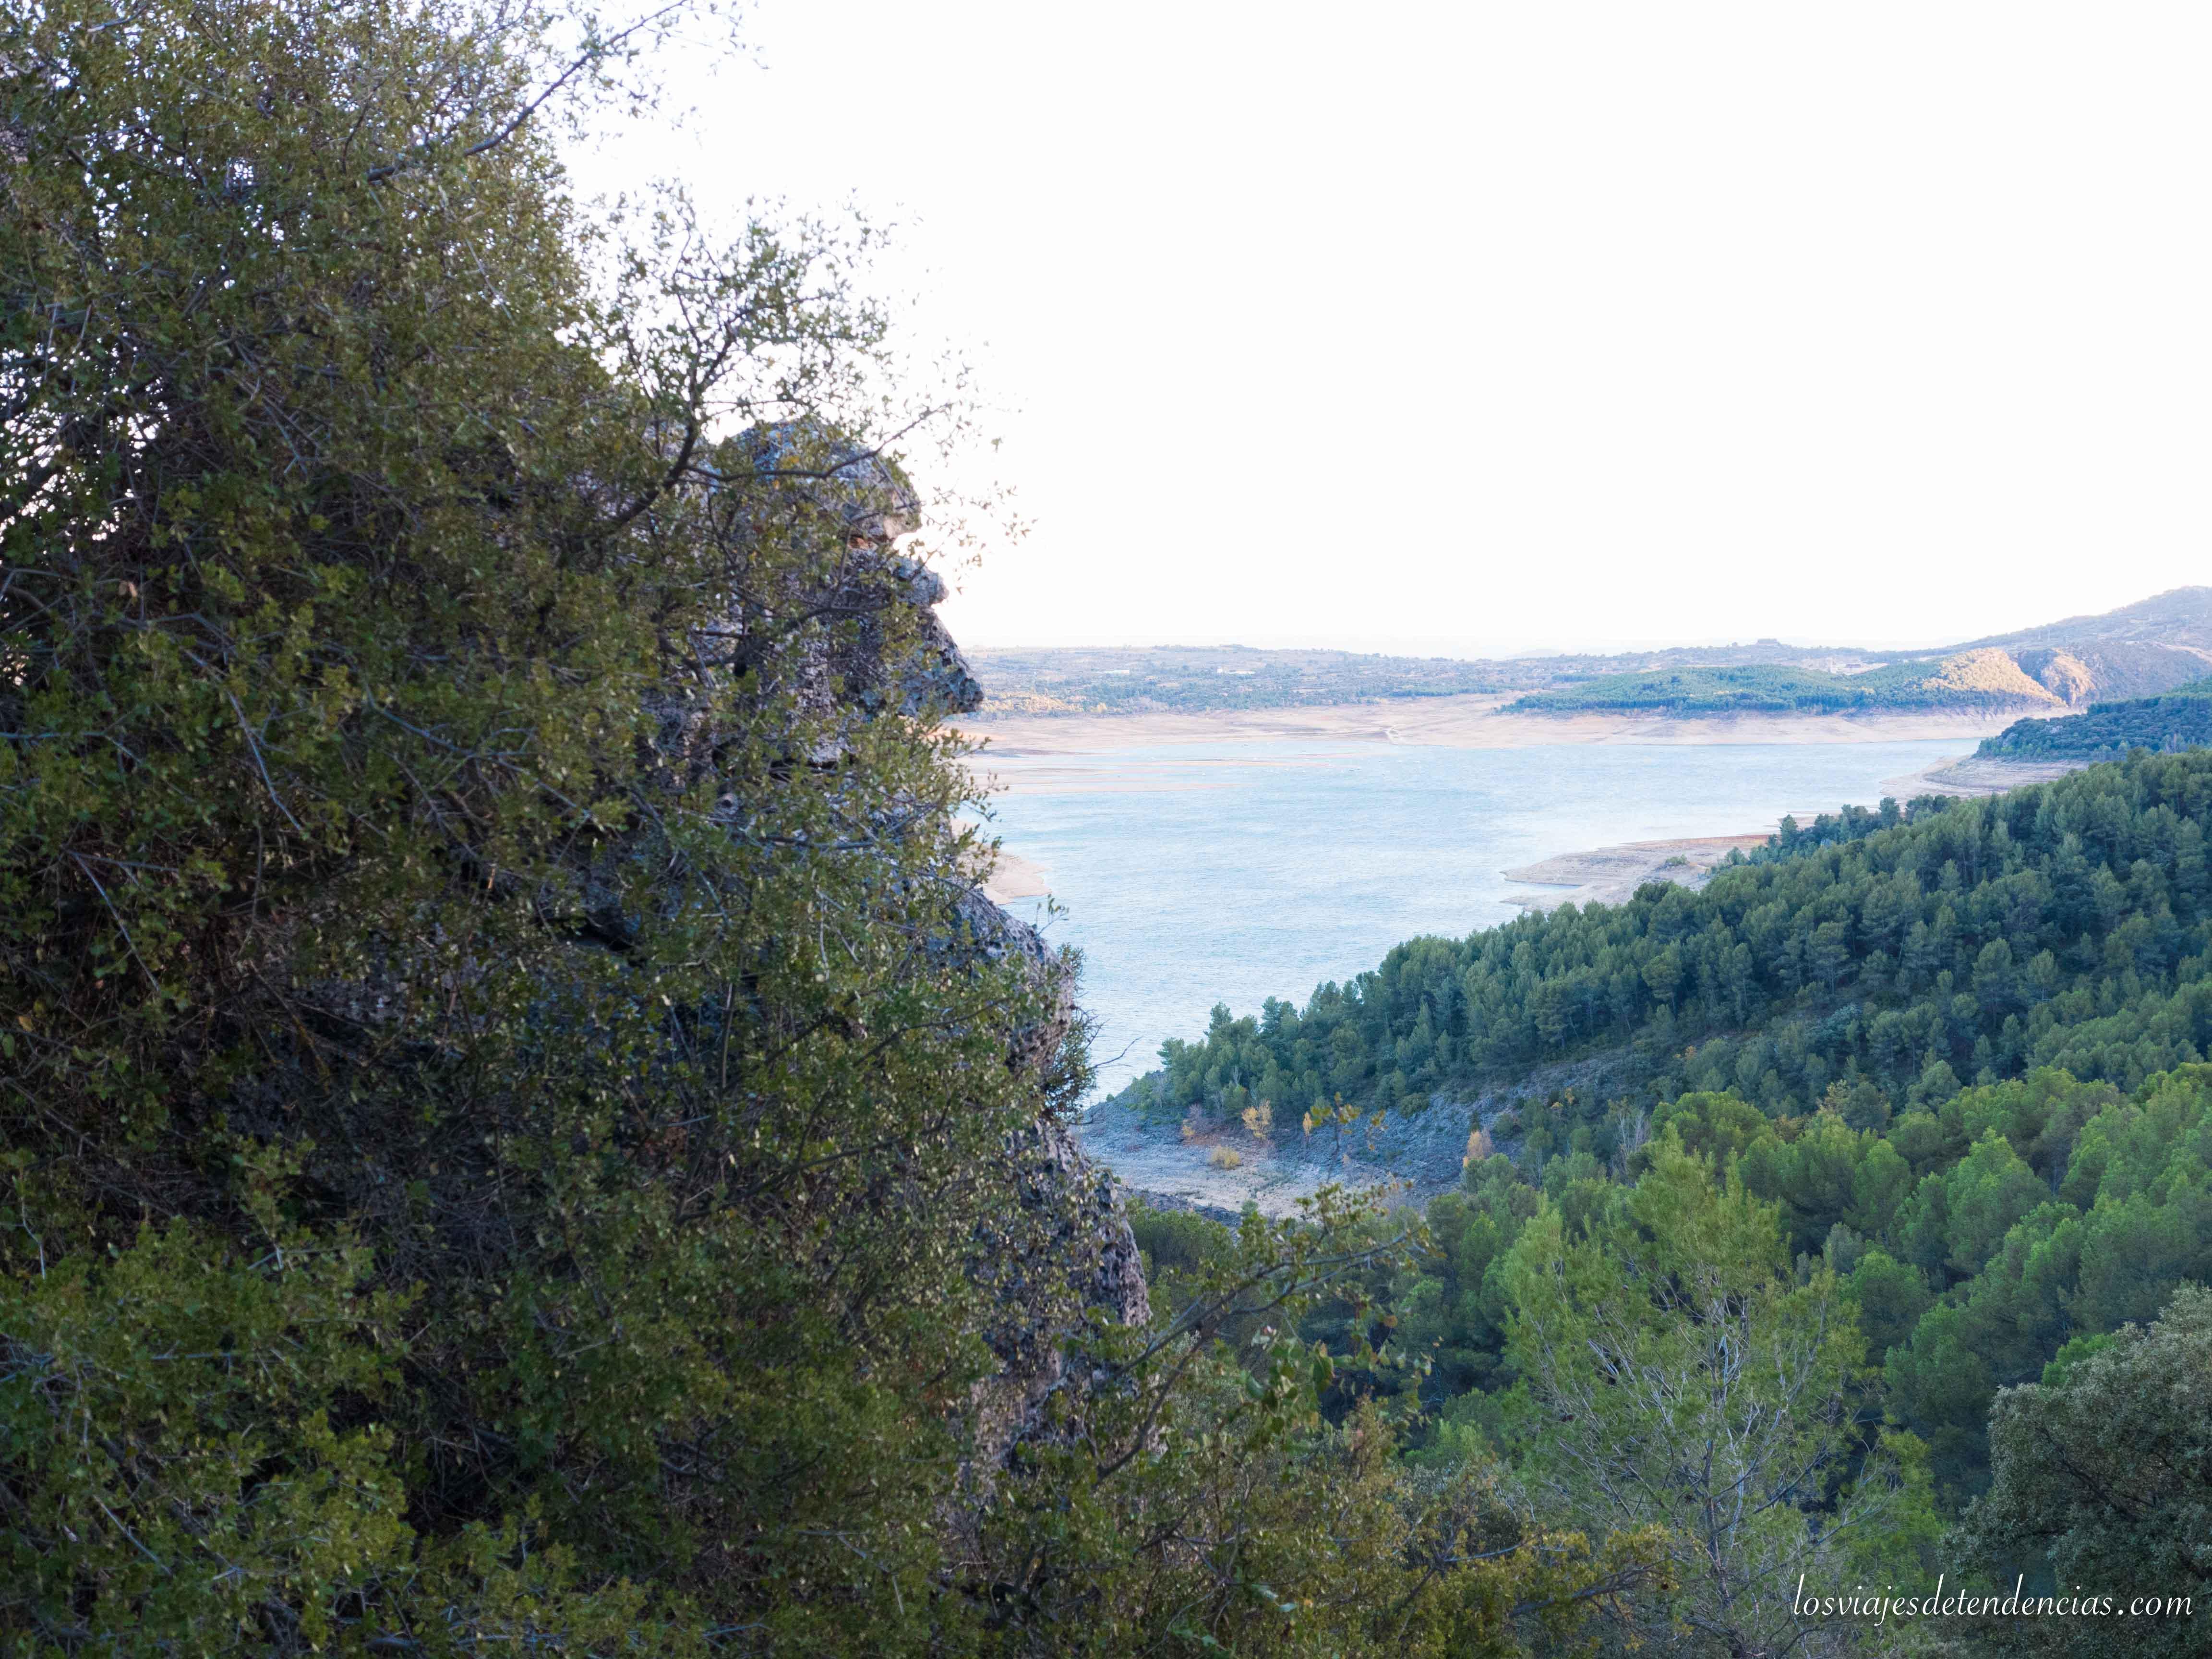 Descubriendo la comarca de la Alcarria